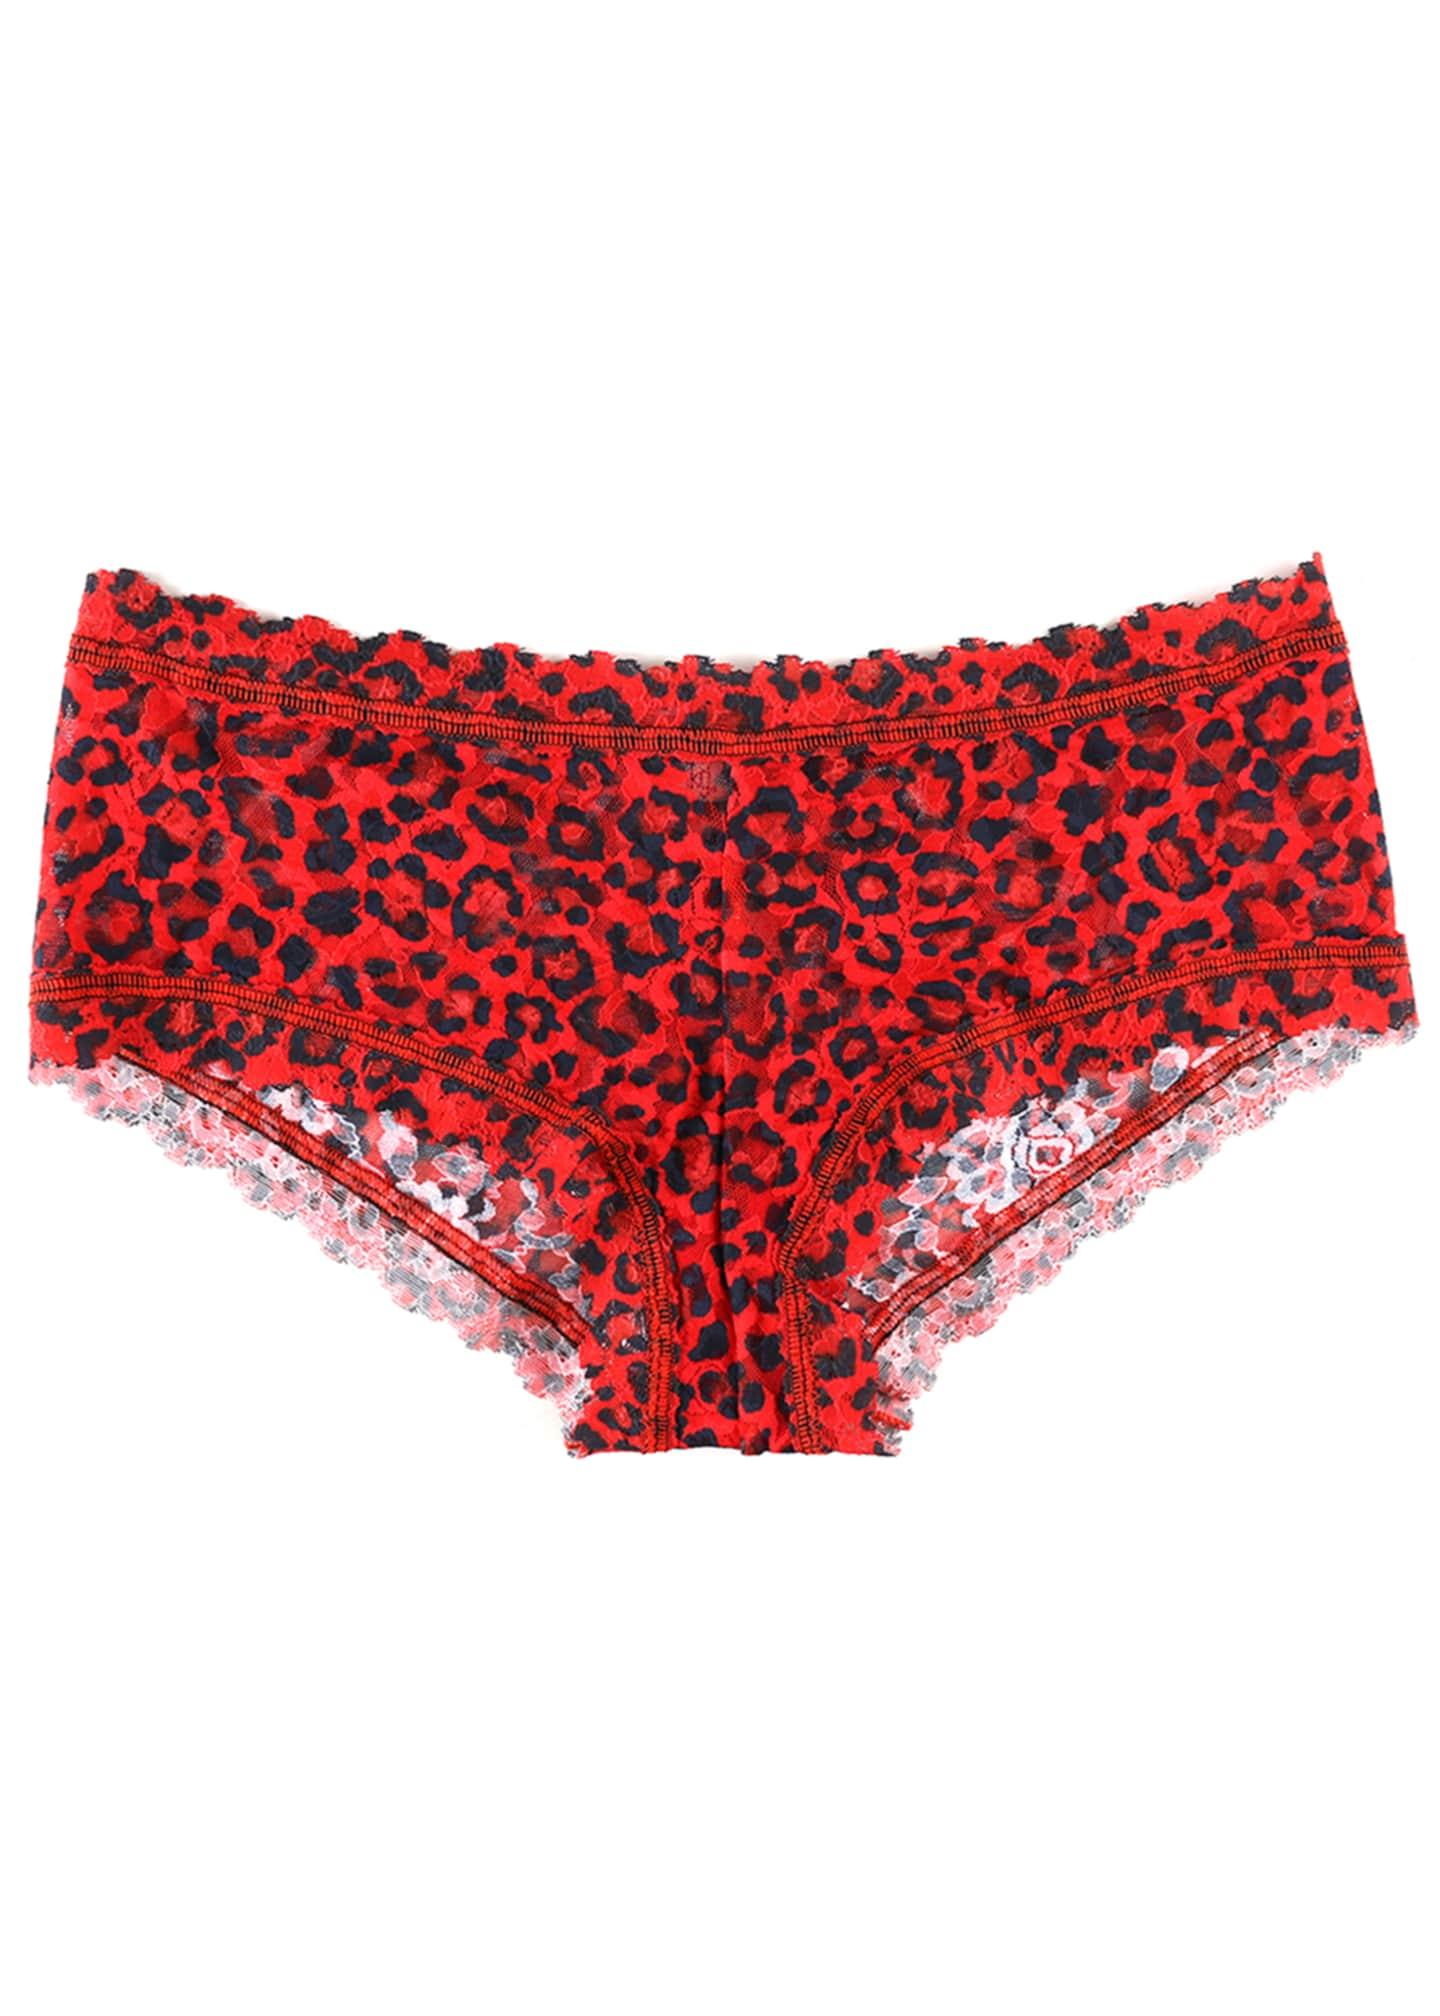 Hanky Panky Leopard-Print Lace Boyshorts